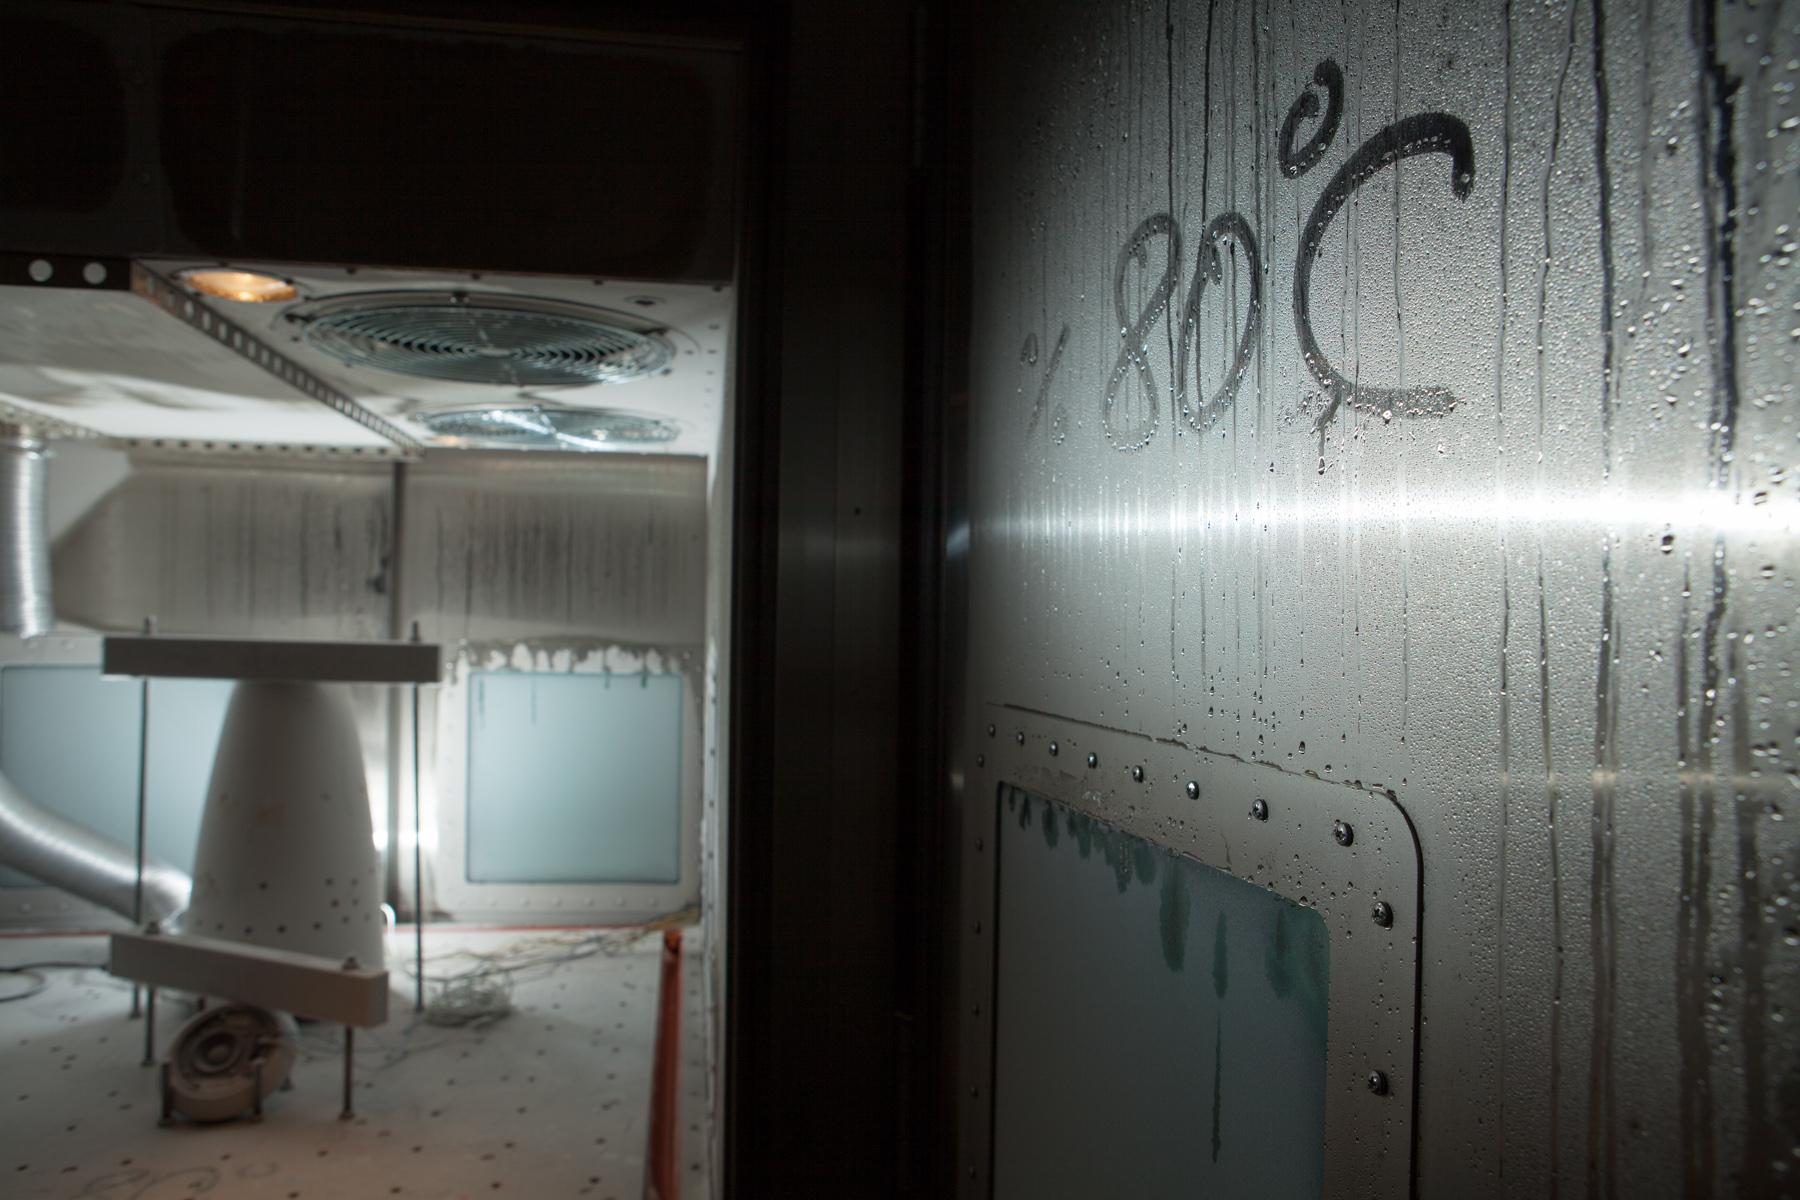 Bang & Olufsen 'Torture Chamber'